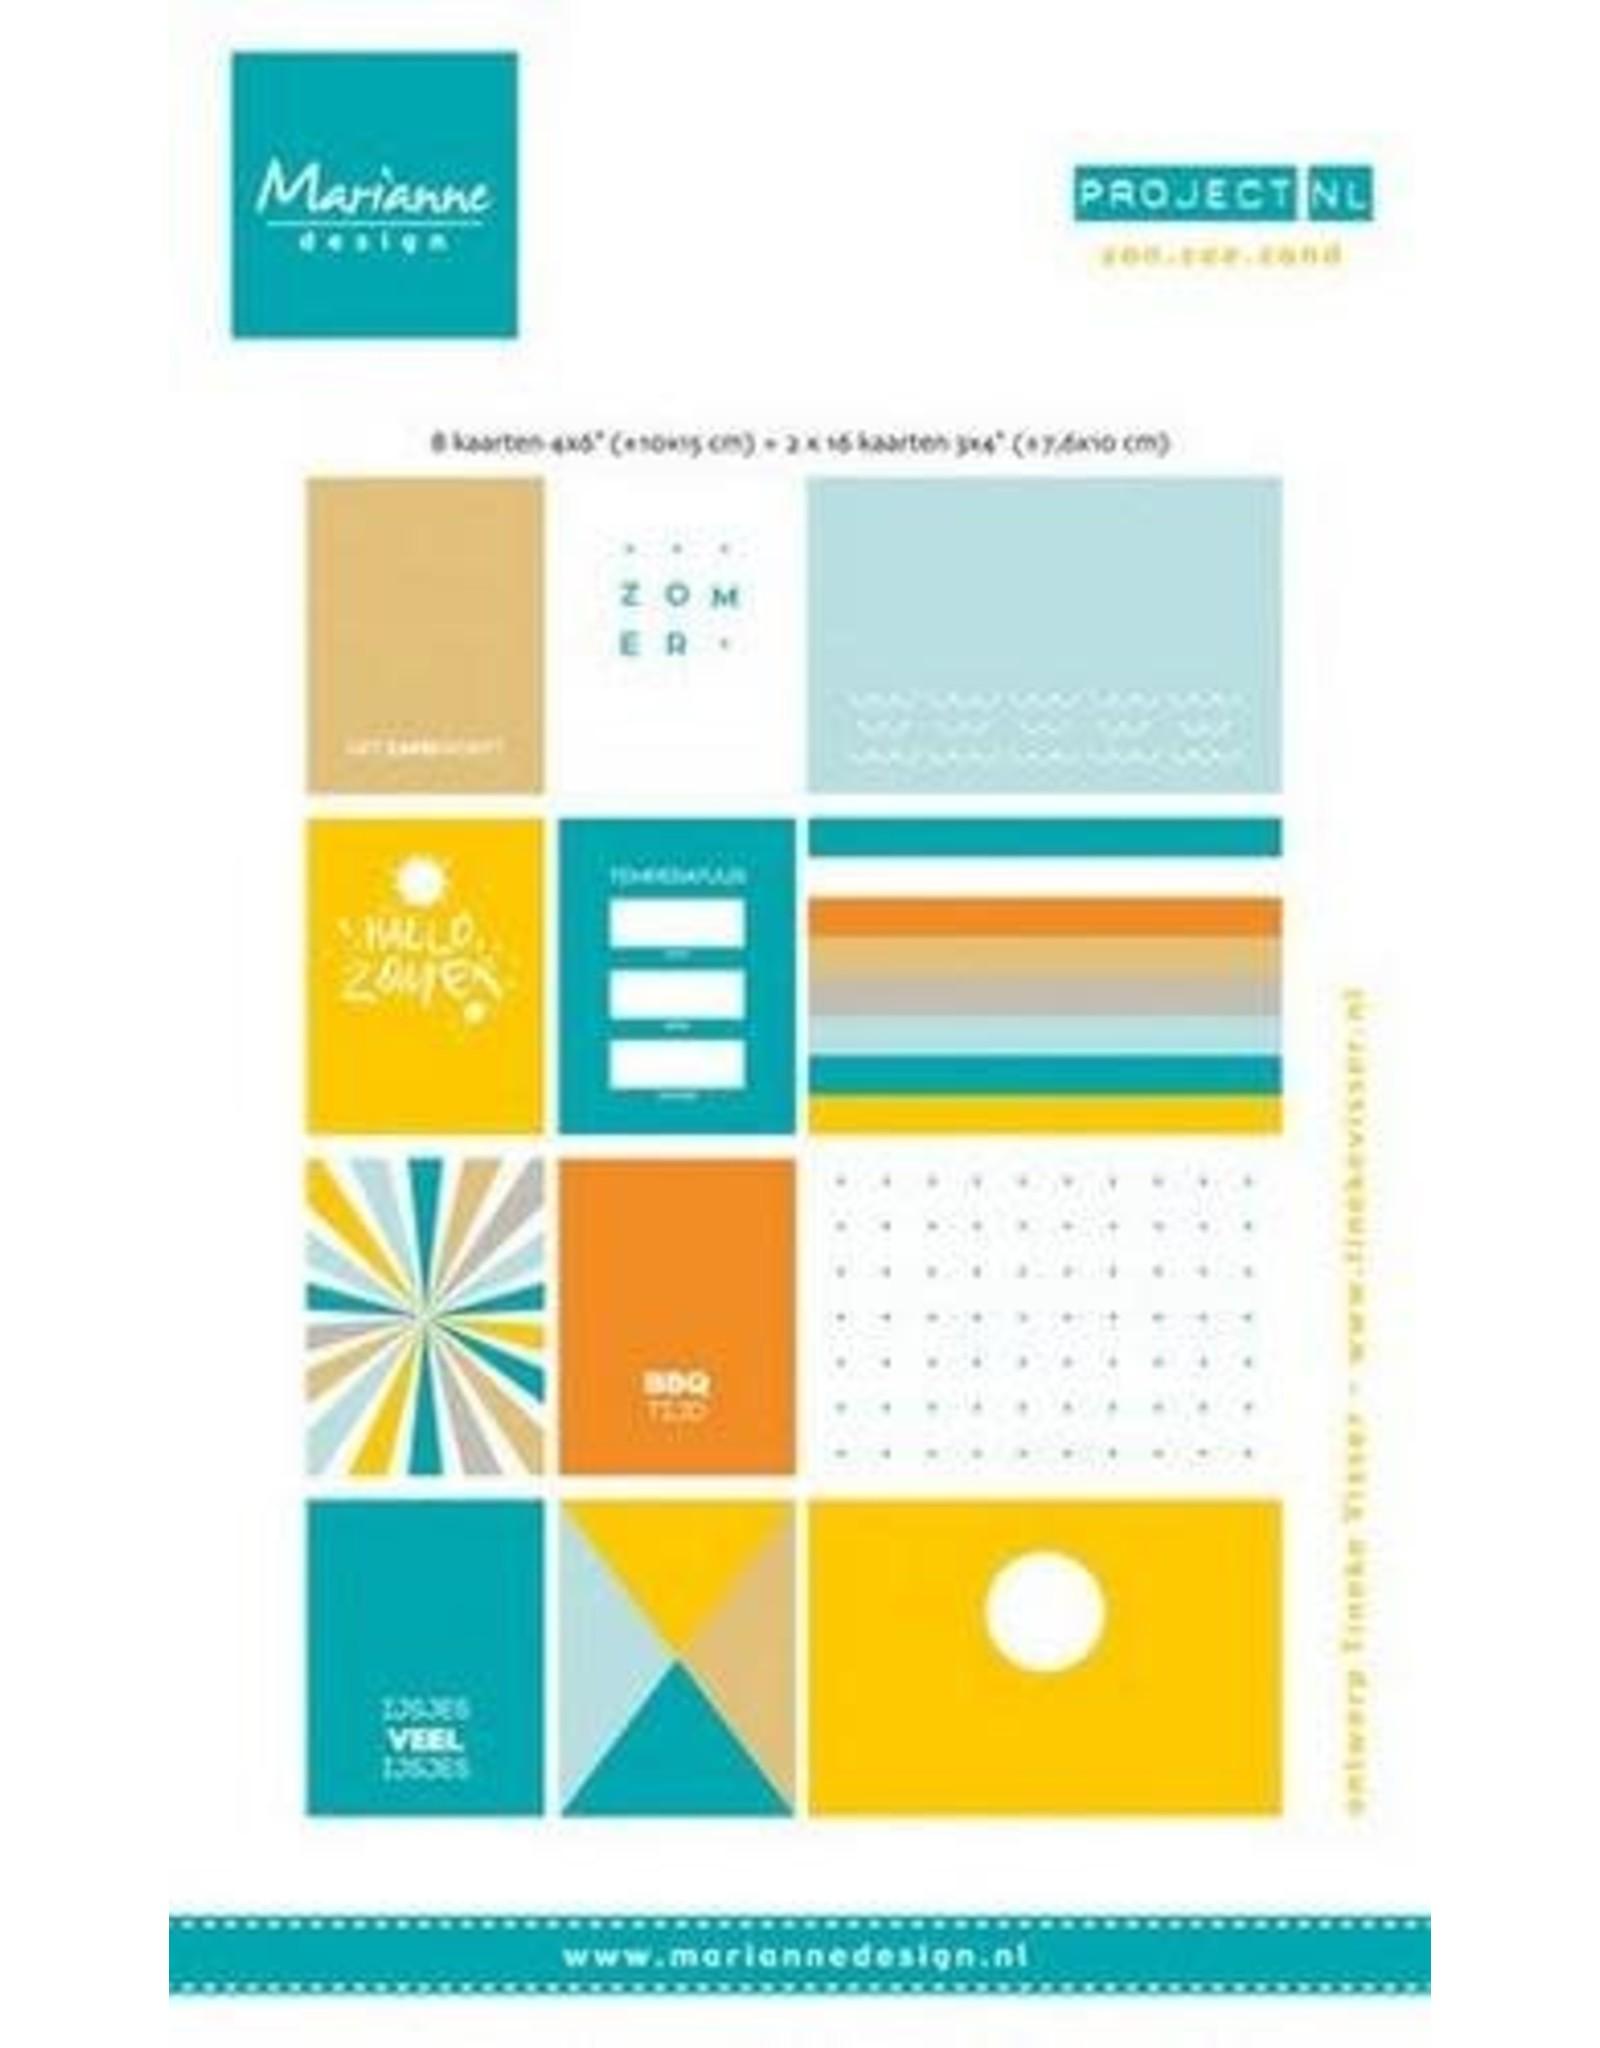 Marianne Design Marianne D Card set Project NL - zon. zee strand (NL)